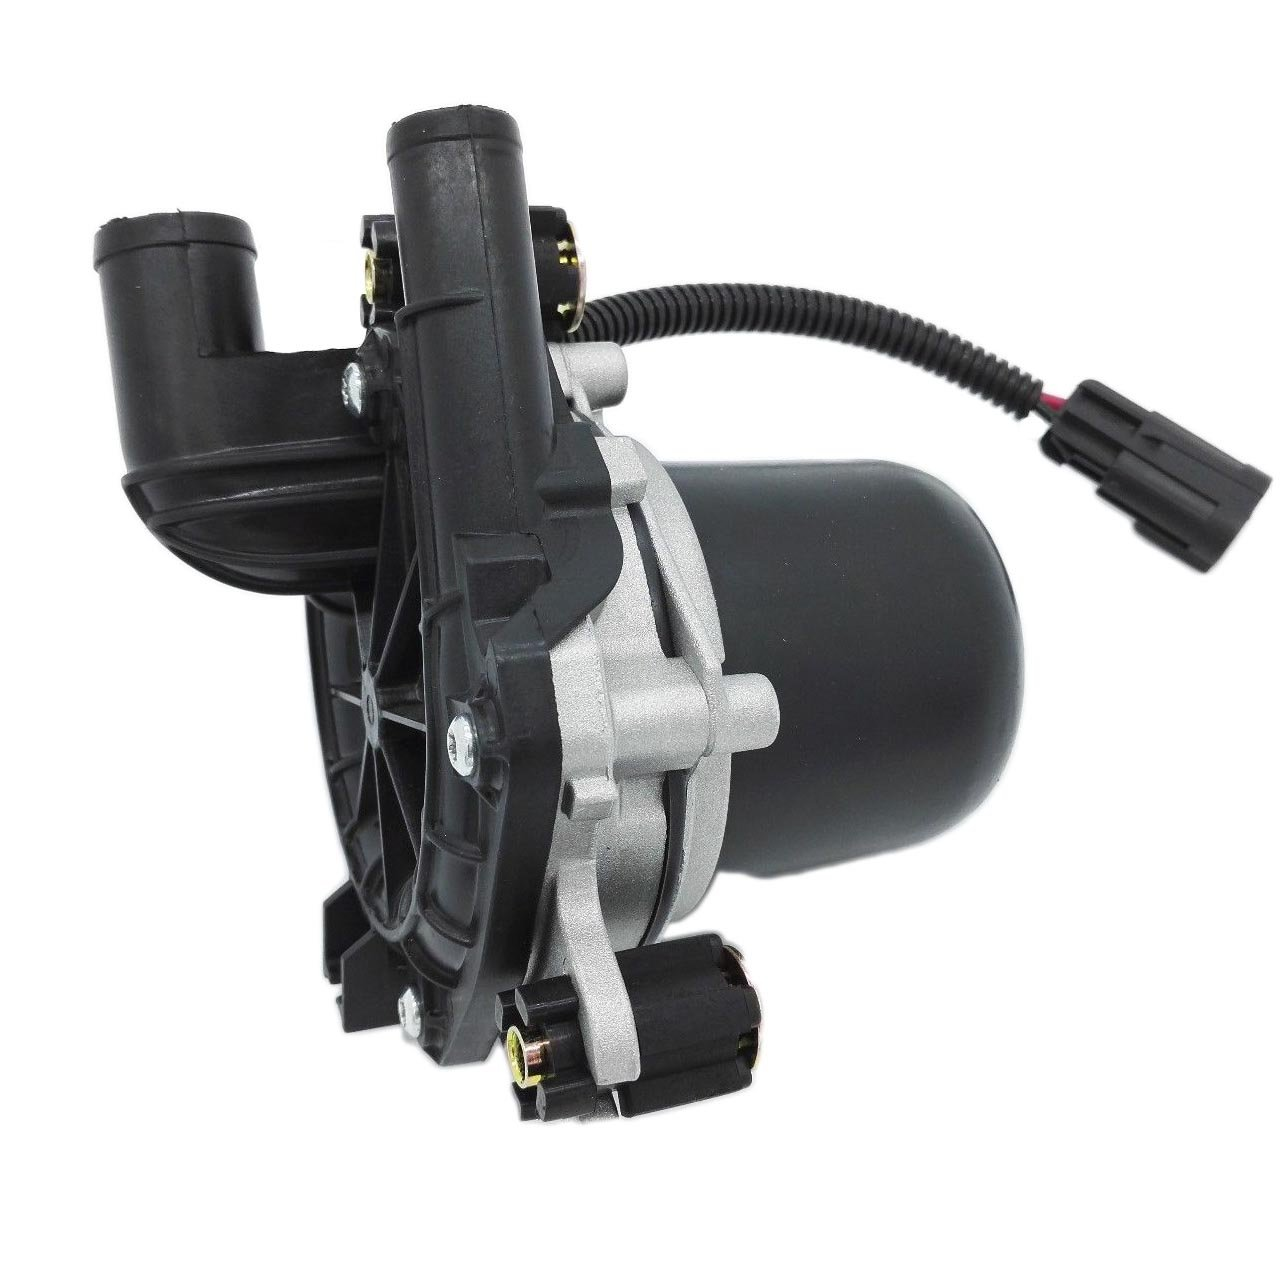 Secondary Air Injection Pump for 2005-2006 Pontiac Grand Prix Buick Allure LaCrosse 3.8L V6 VIN: 2